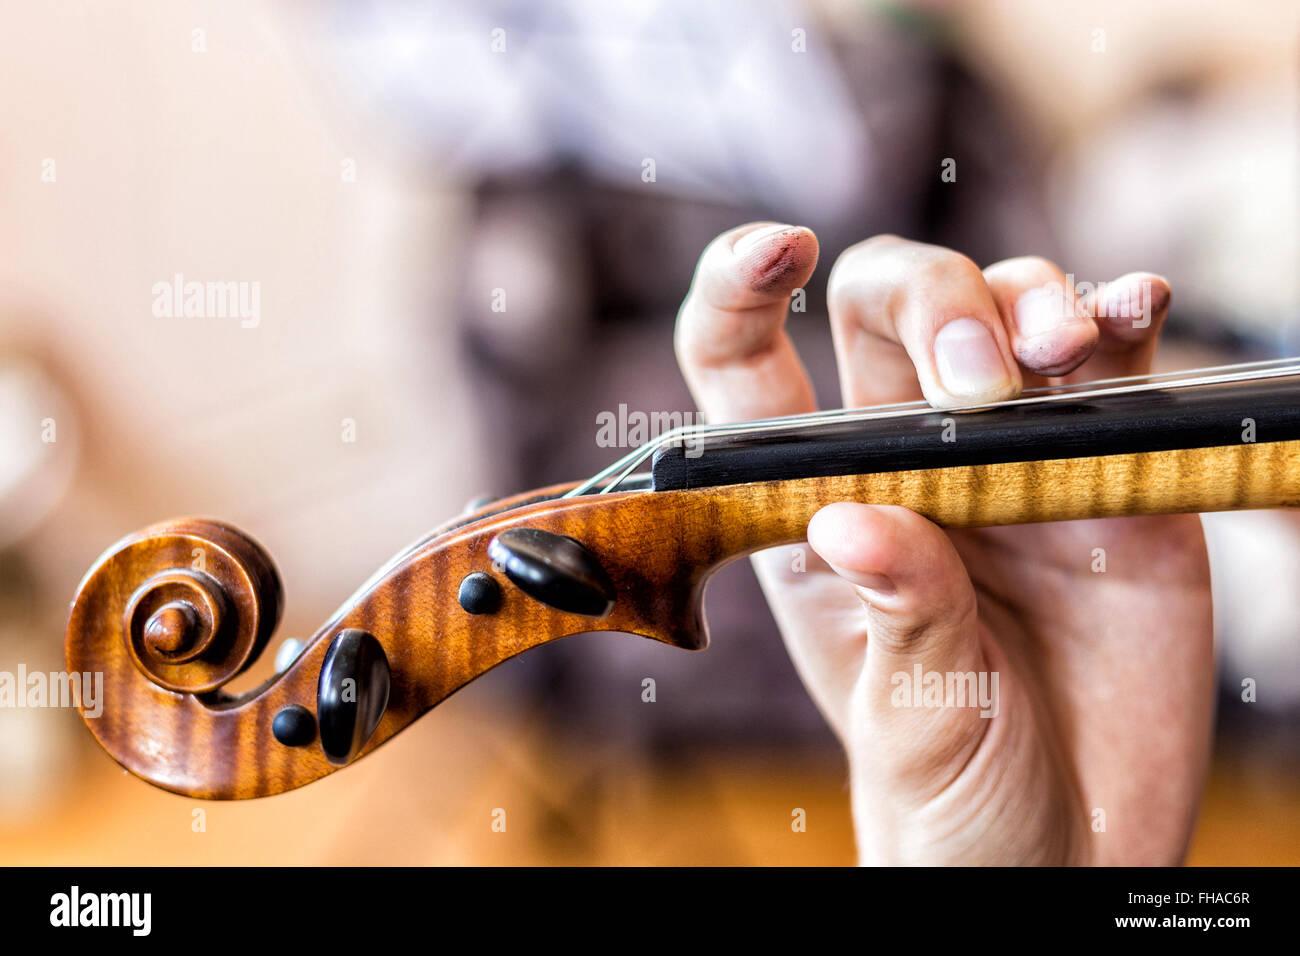 Tocar el violín Imagen De Stock